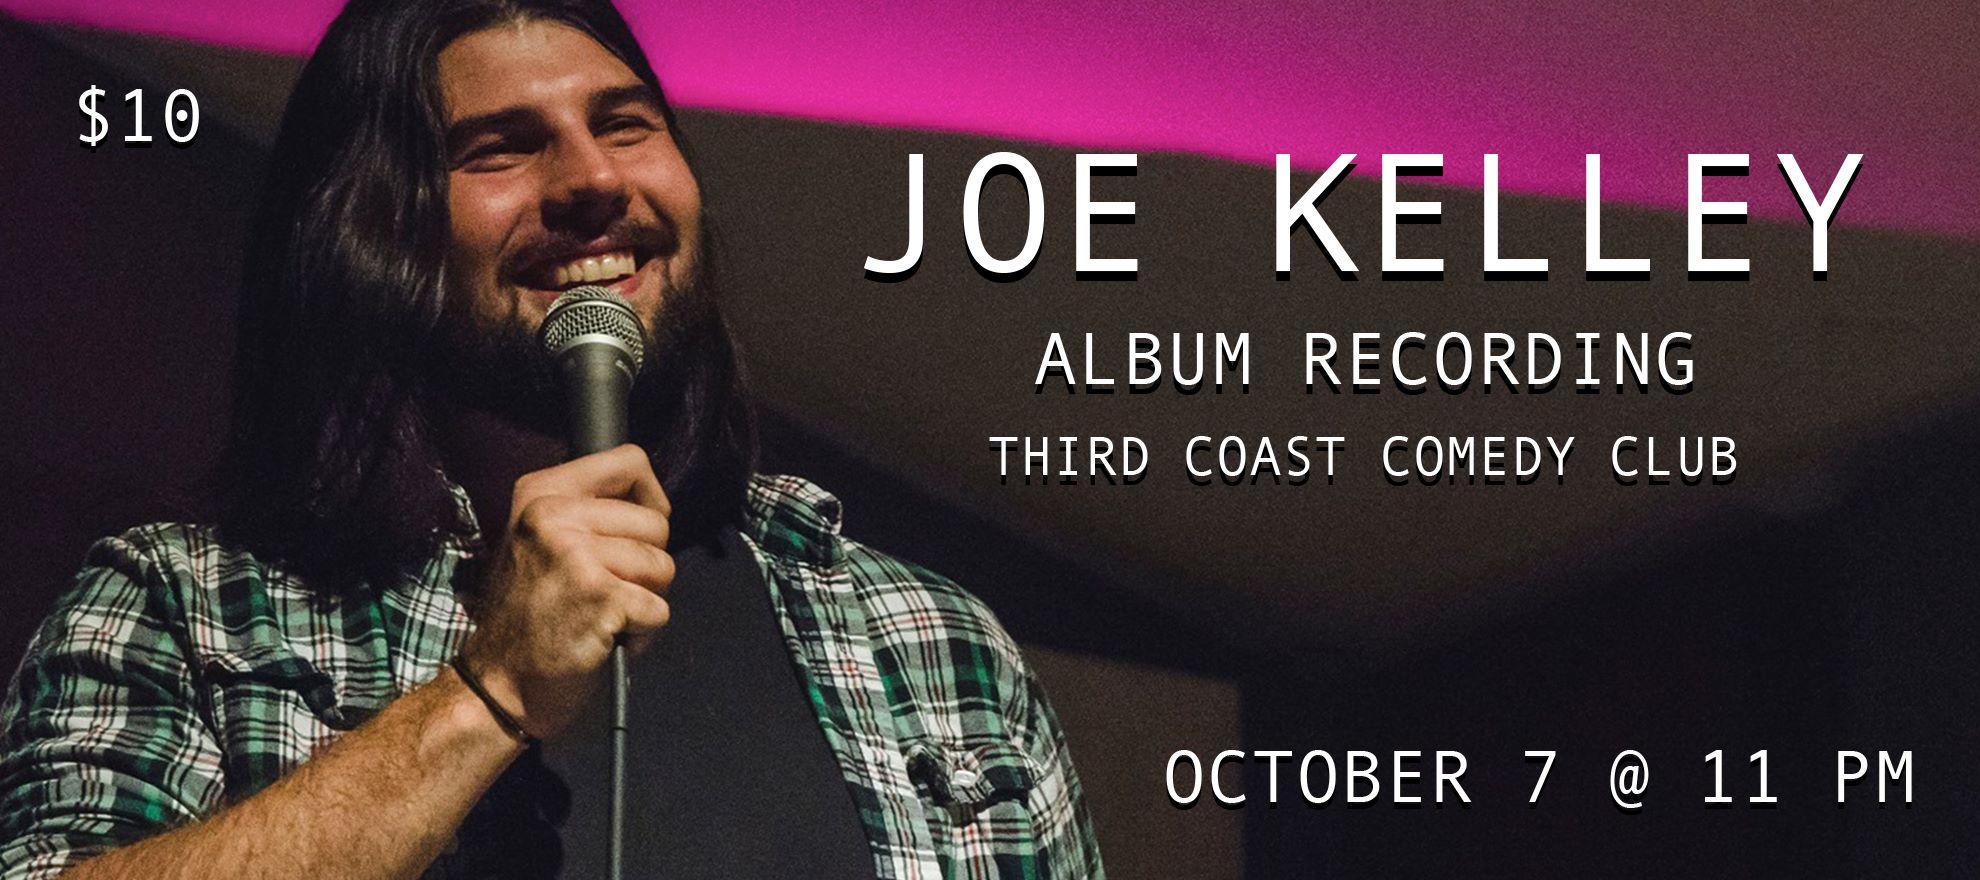 Joe Kelley album recording 10/7/2017